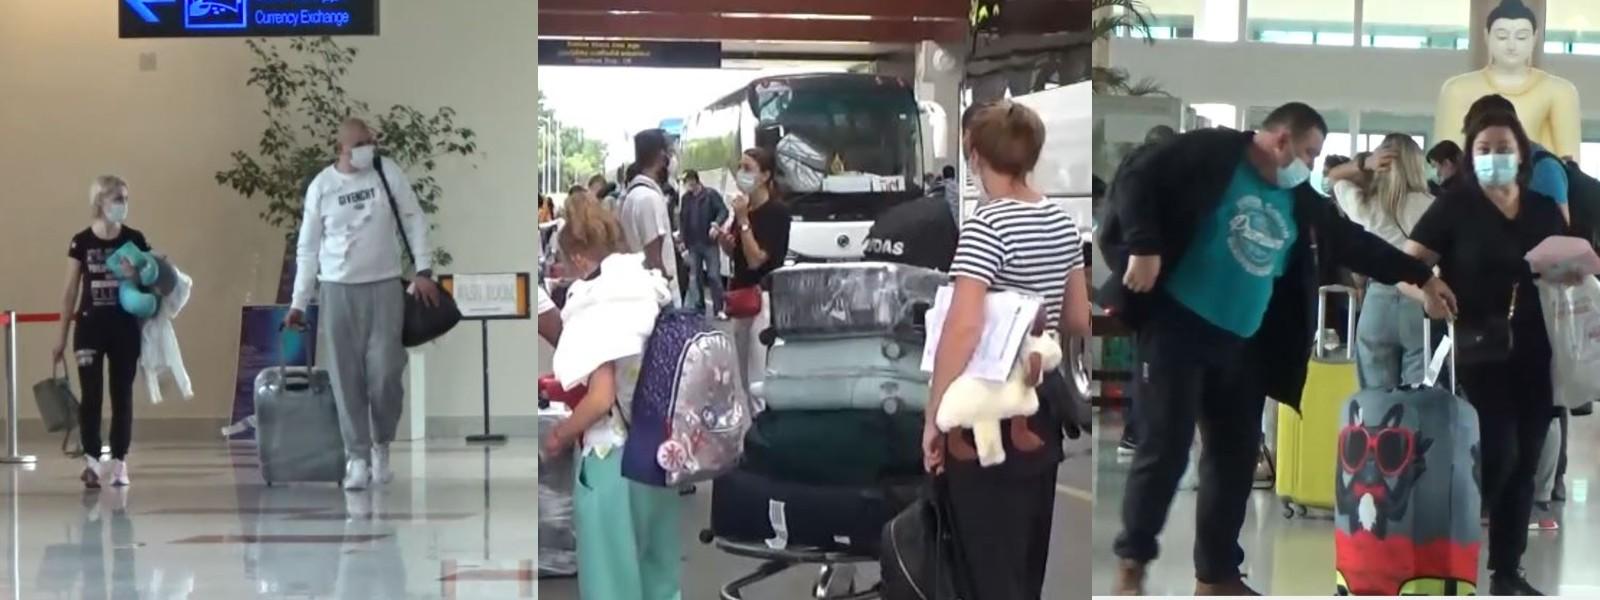 165 UKRAINIAN TOURISTS ARRIVE IN SRI LANKA